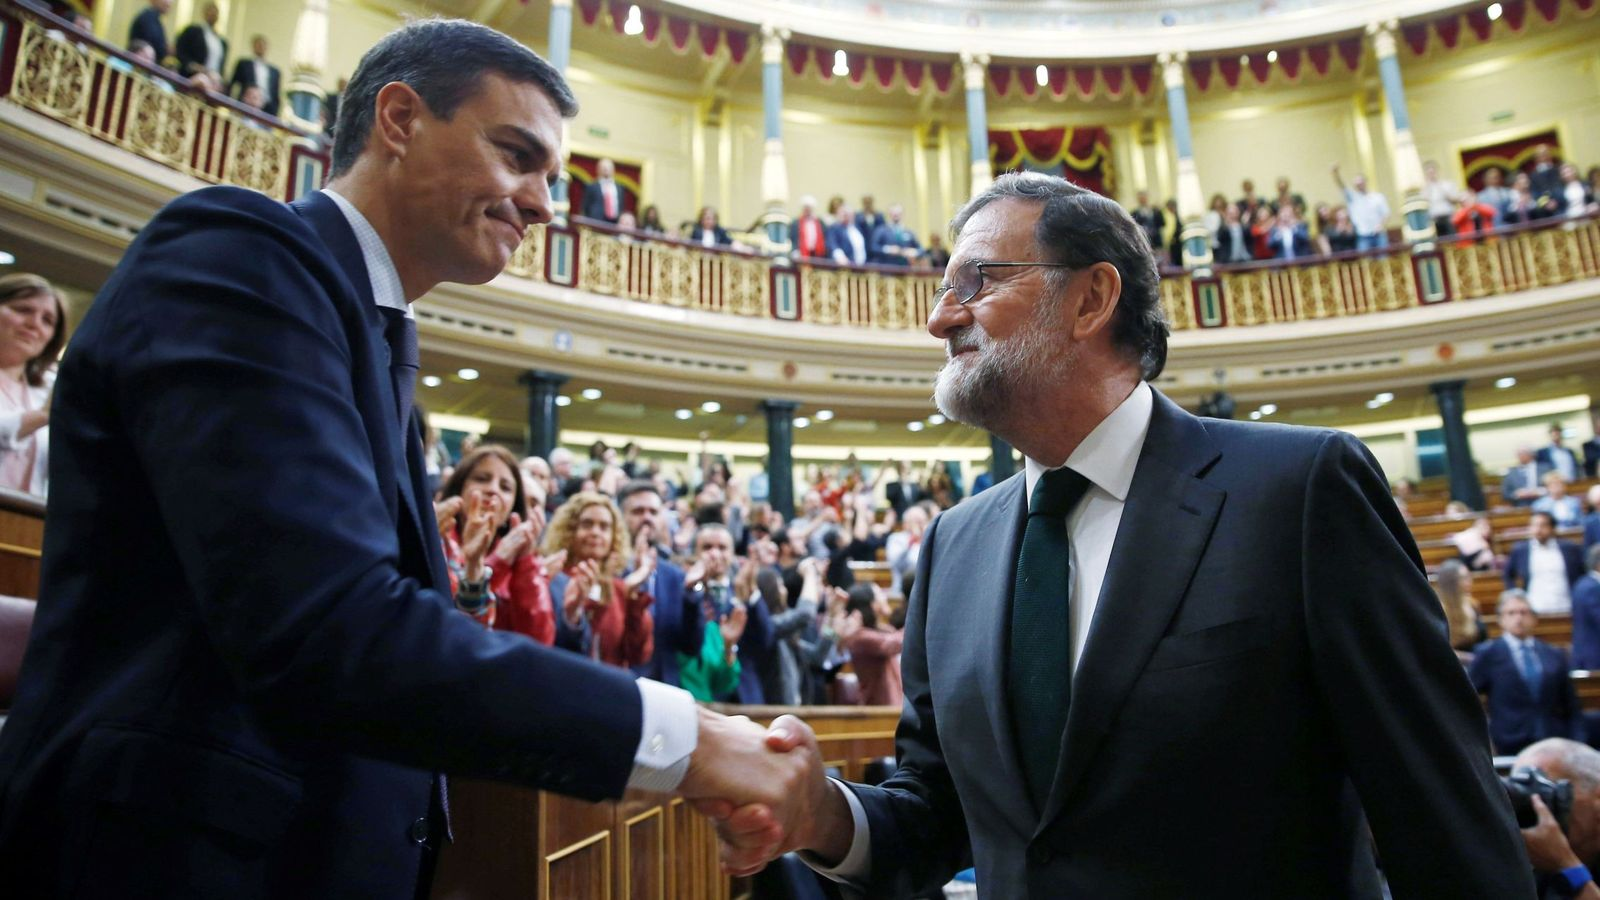 Untuk Pertama Kali Spanyol Lantik Perdana Menteri Tanpa Kitab Suci